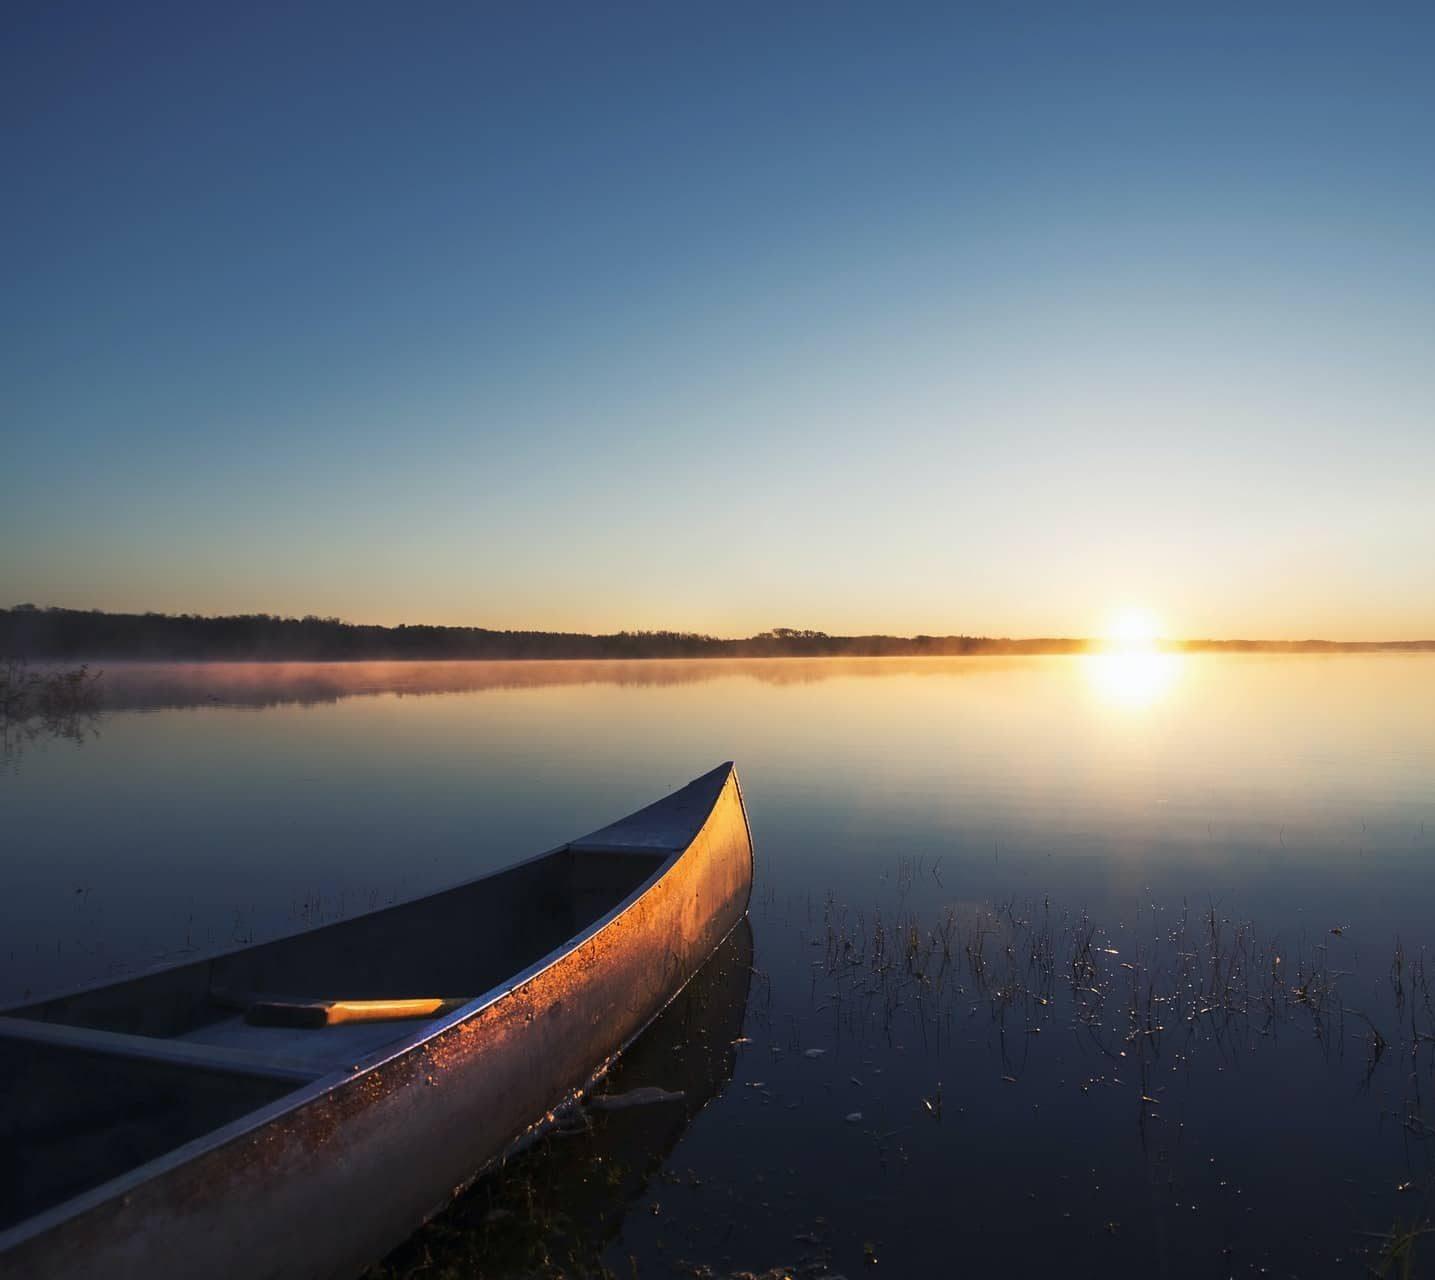 A canoe on a flat calm lake at sunset.